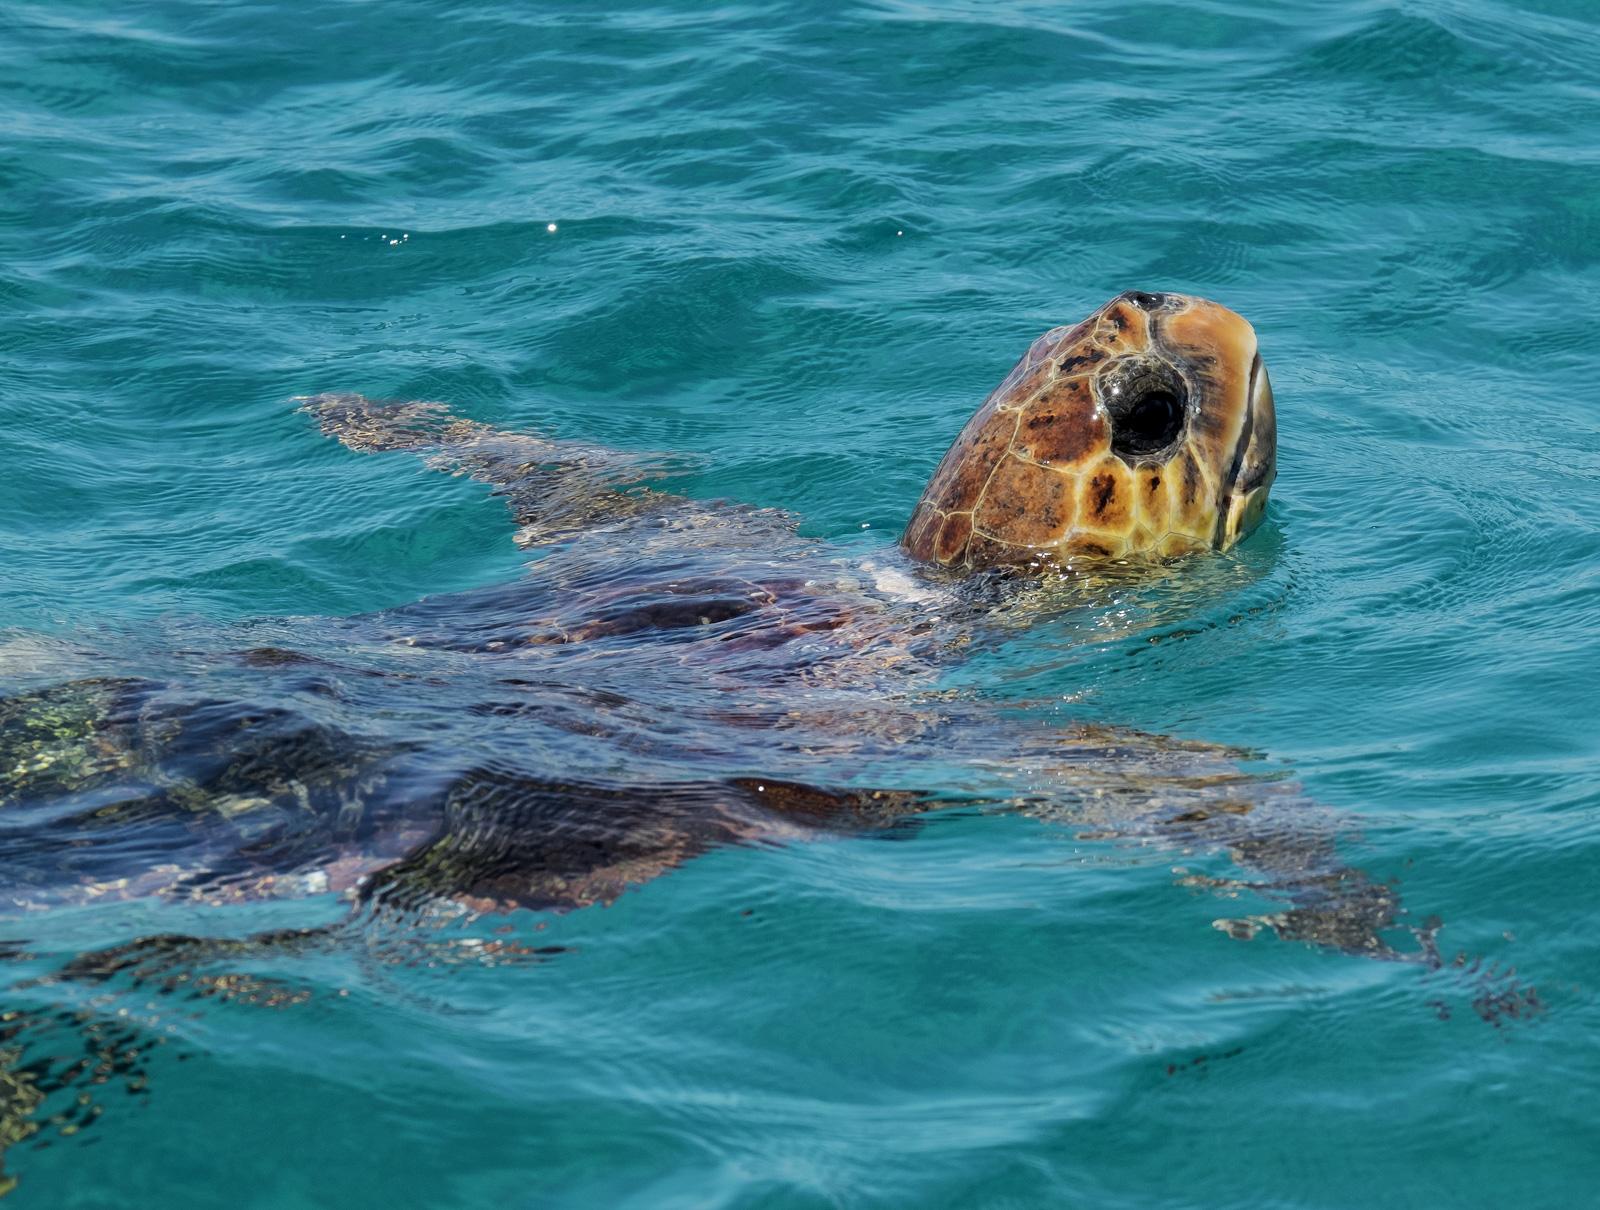 Turtle Zakynthos, Turtle Island, Zakynthos, Greece, Greek, islands, turtles, caves, rising, breath, dived, Loggerhead, n, photo